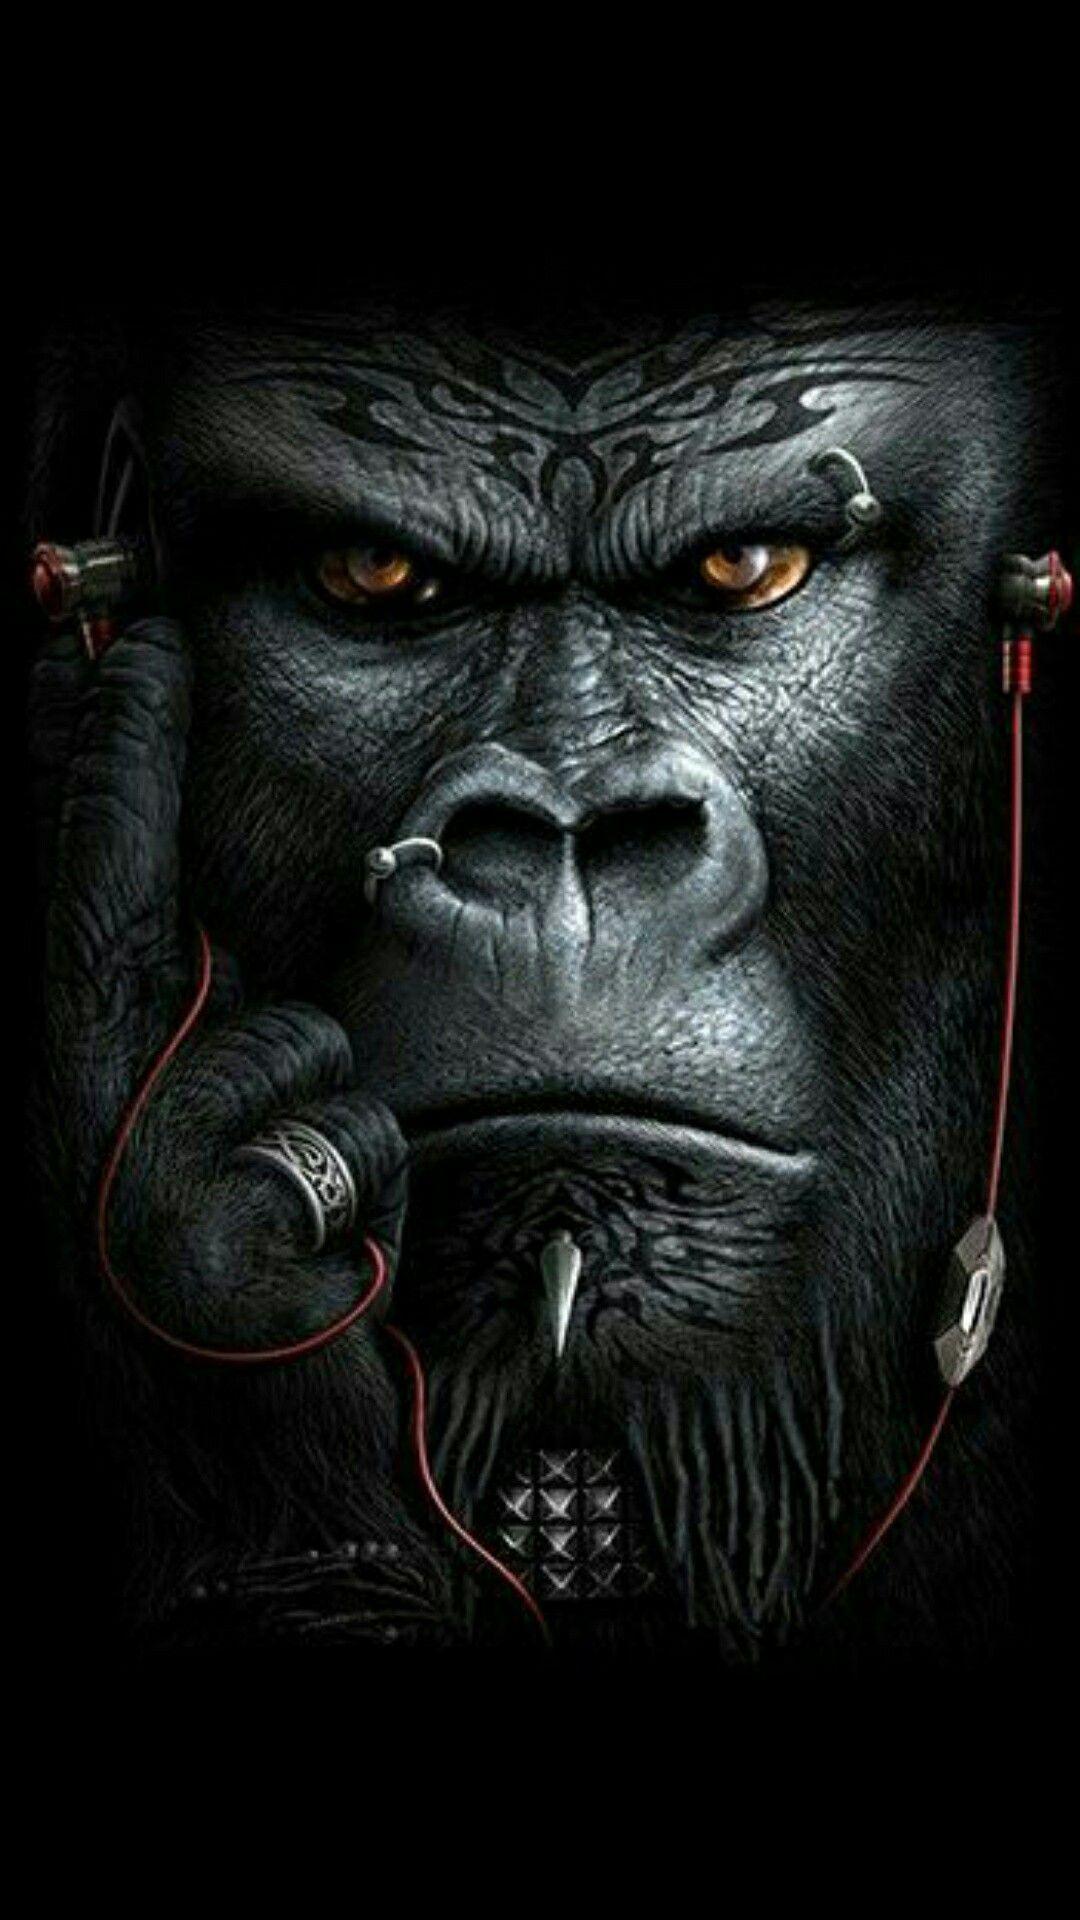 Pin Ot Polzovatelya Dawid Van Der Gryp Na Doske Oboi Gorilla Tatu Tatuirovki Obezyan King Kong